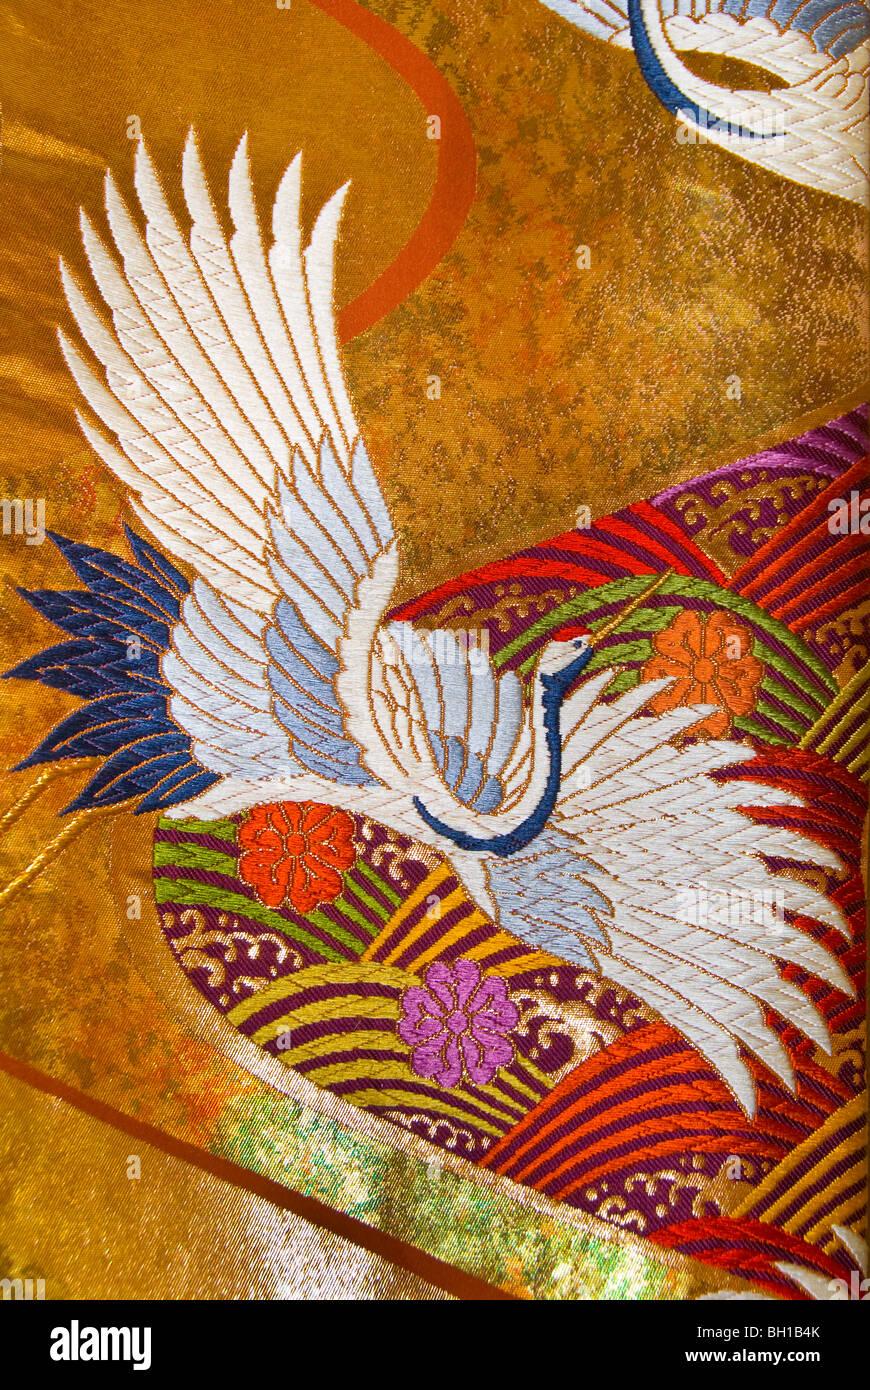 Asian brocade fabric with crane pattern, close-up - Stock Image